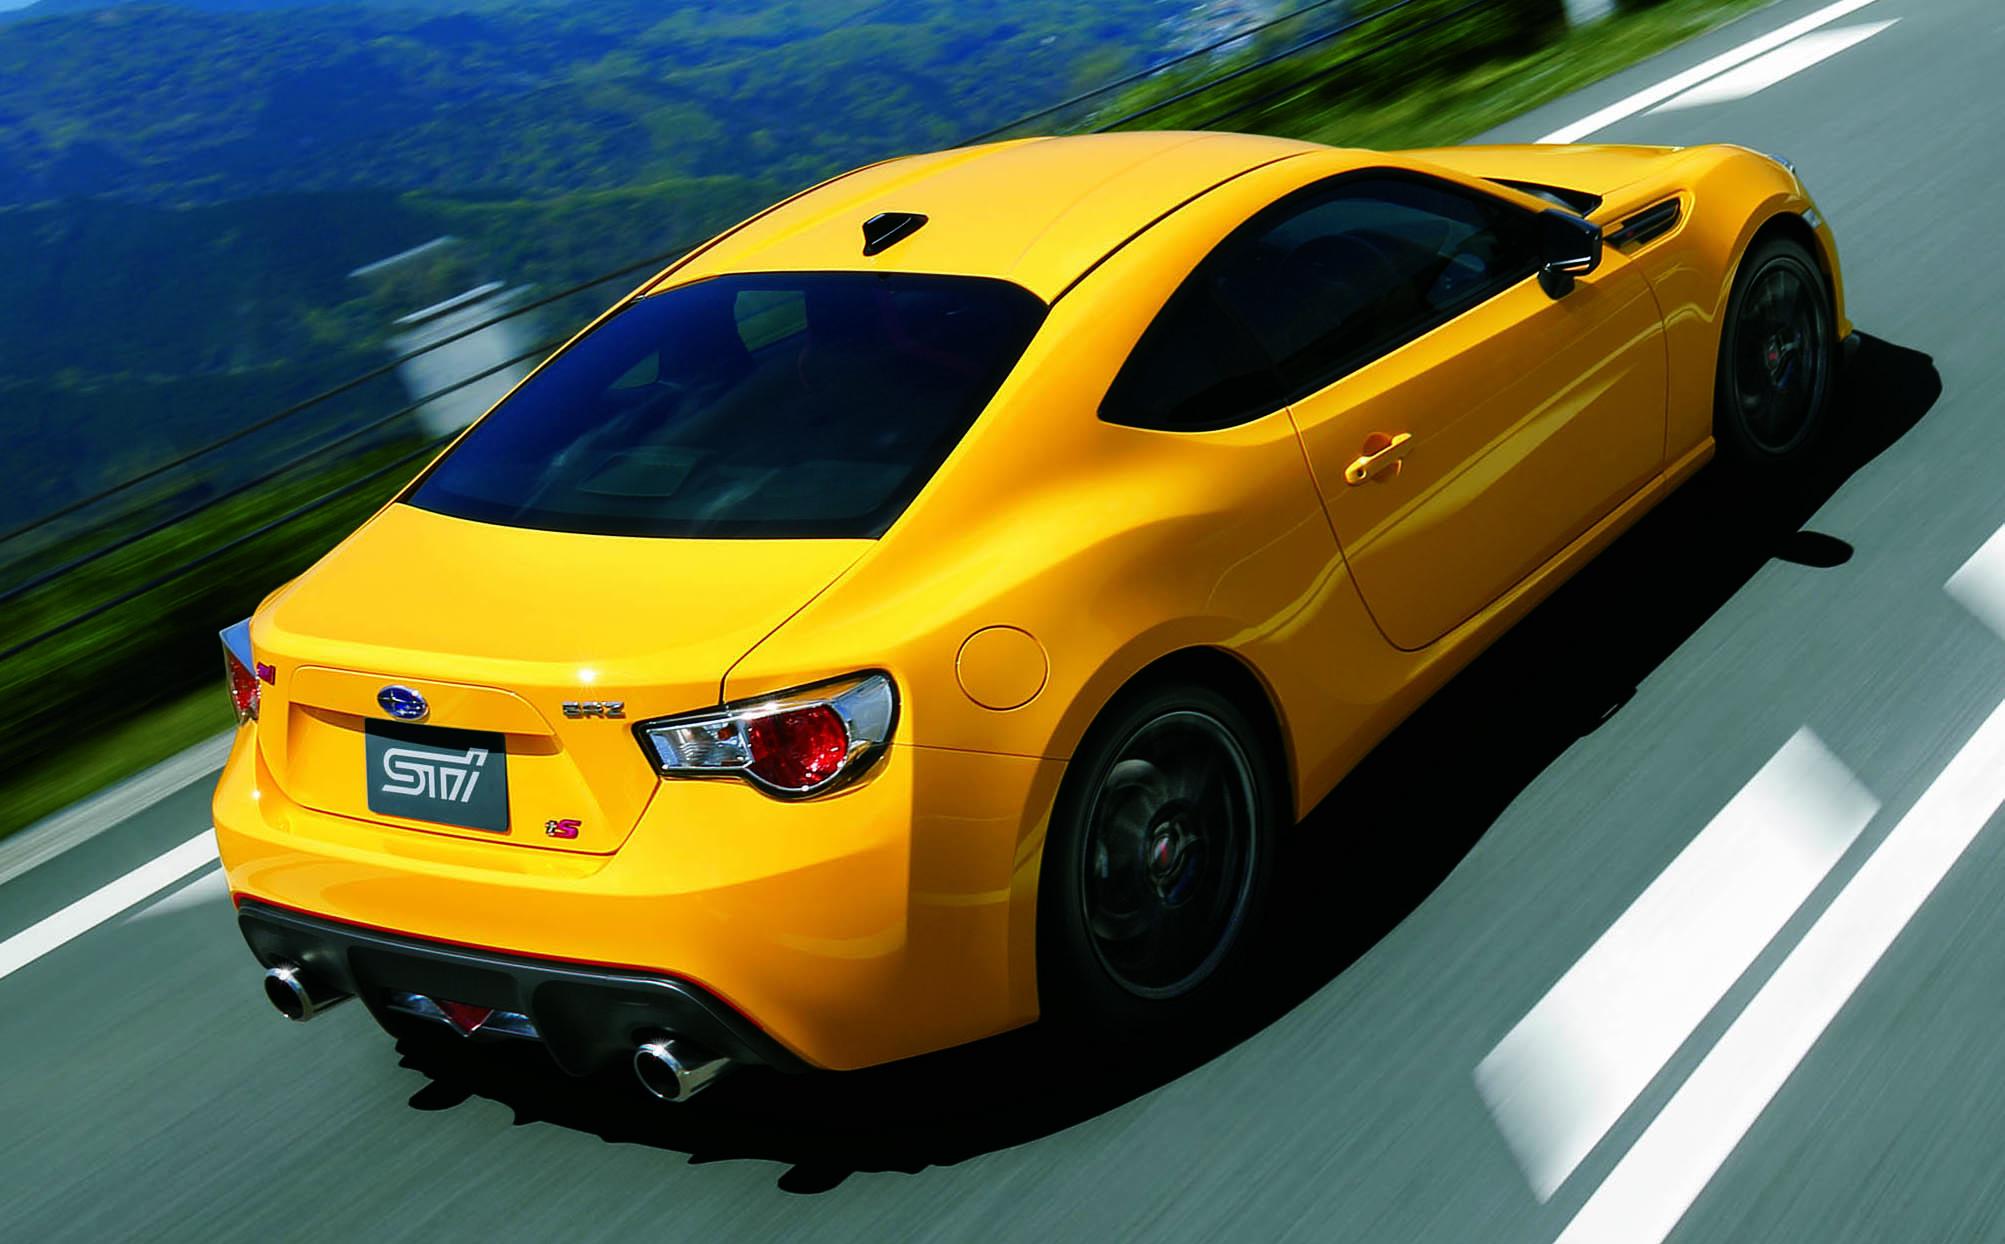 Subaru Brz 2018 Sti >> 2015 Subaru BRZ tS STi announced for Japan, limited to 300 units | PerformanceDrive